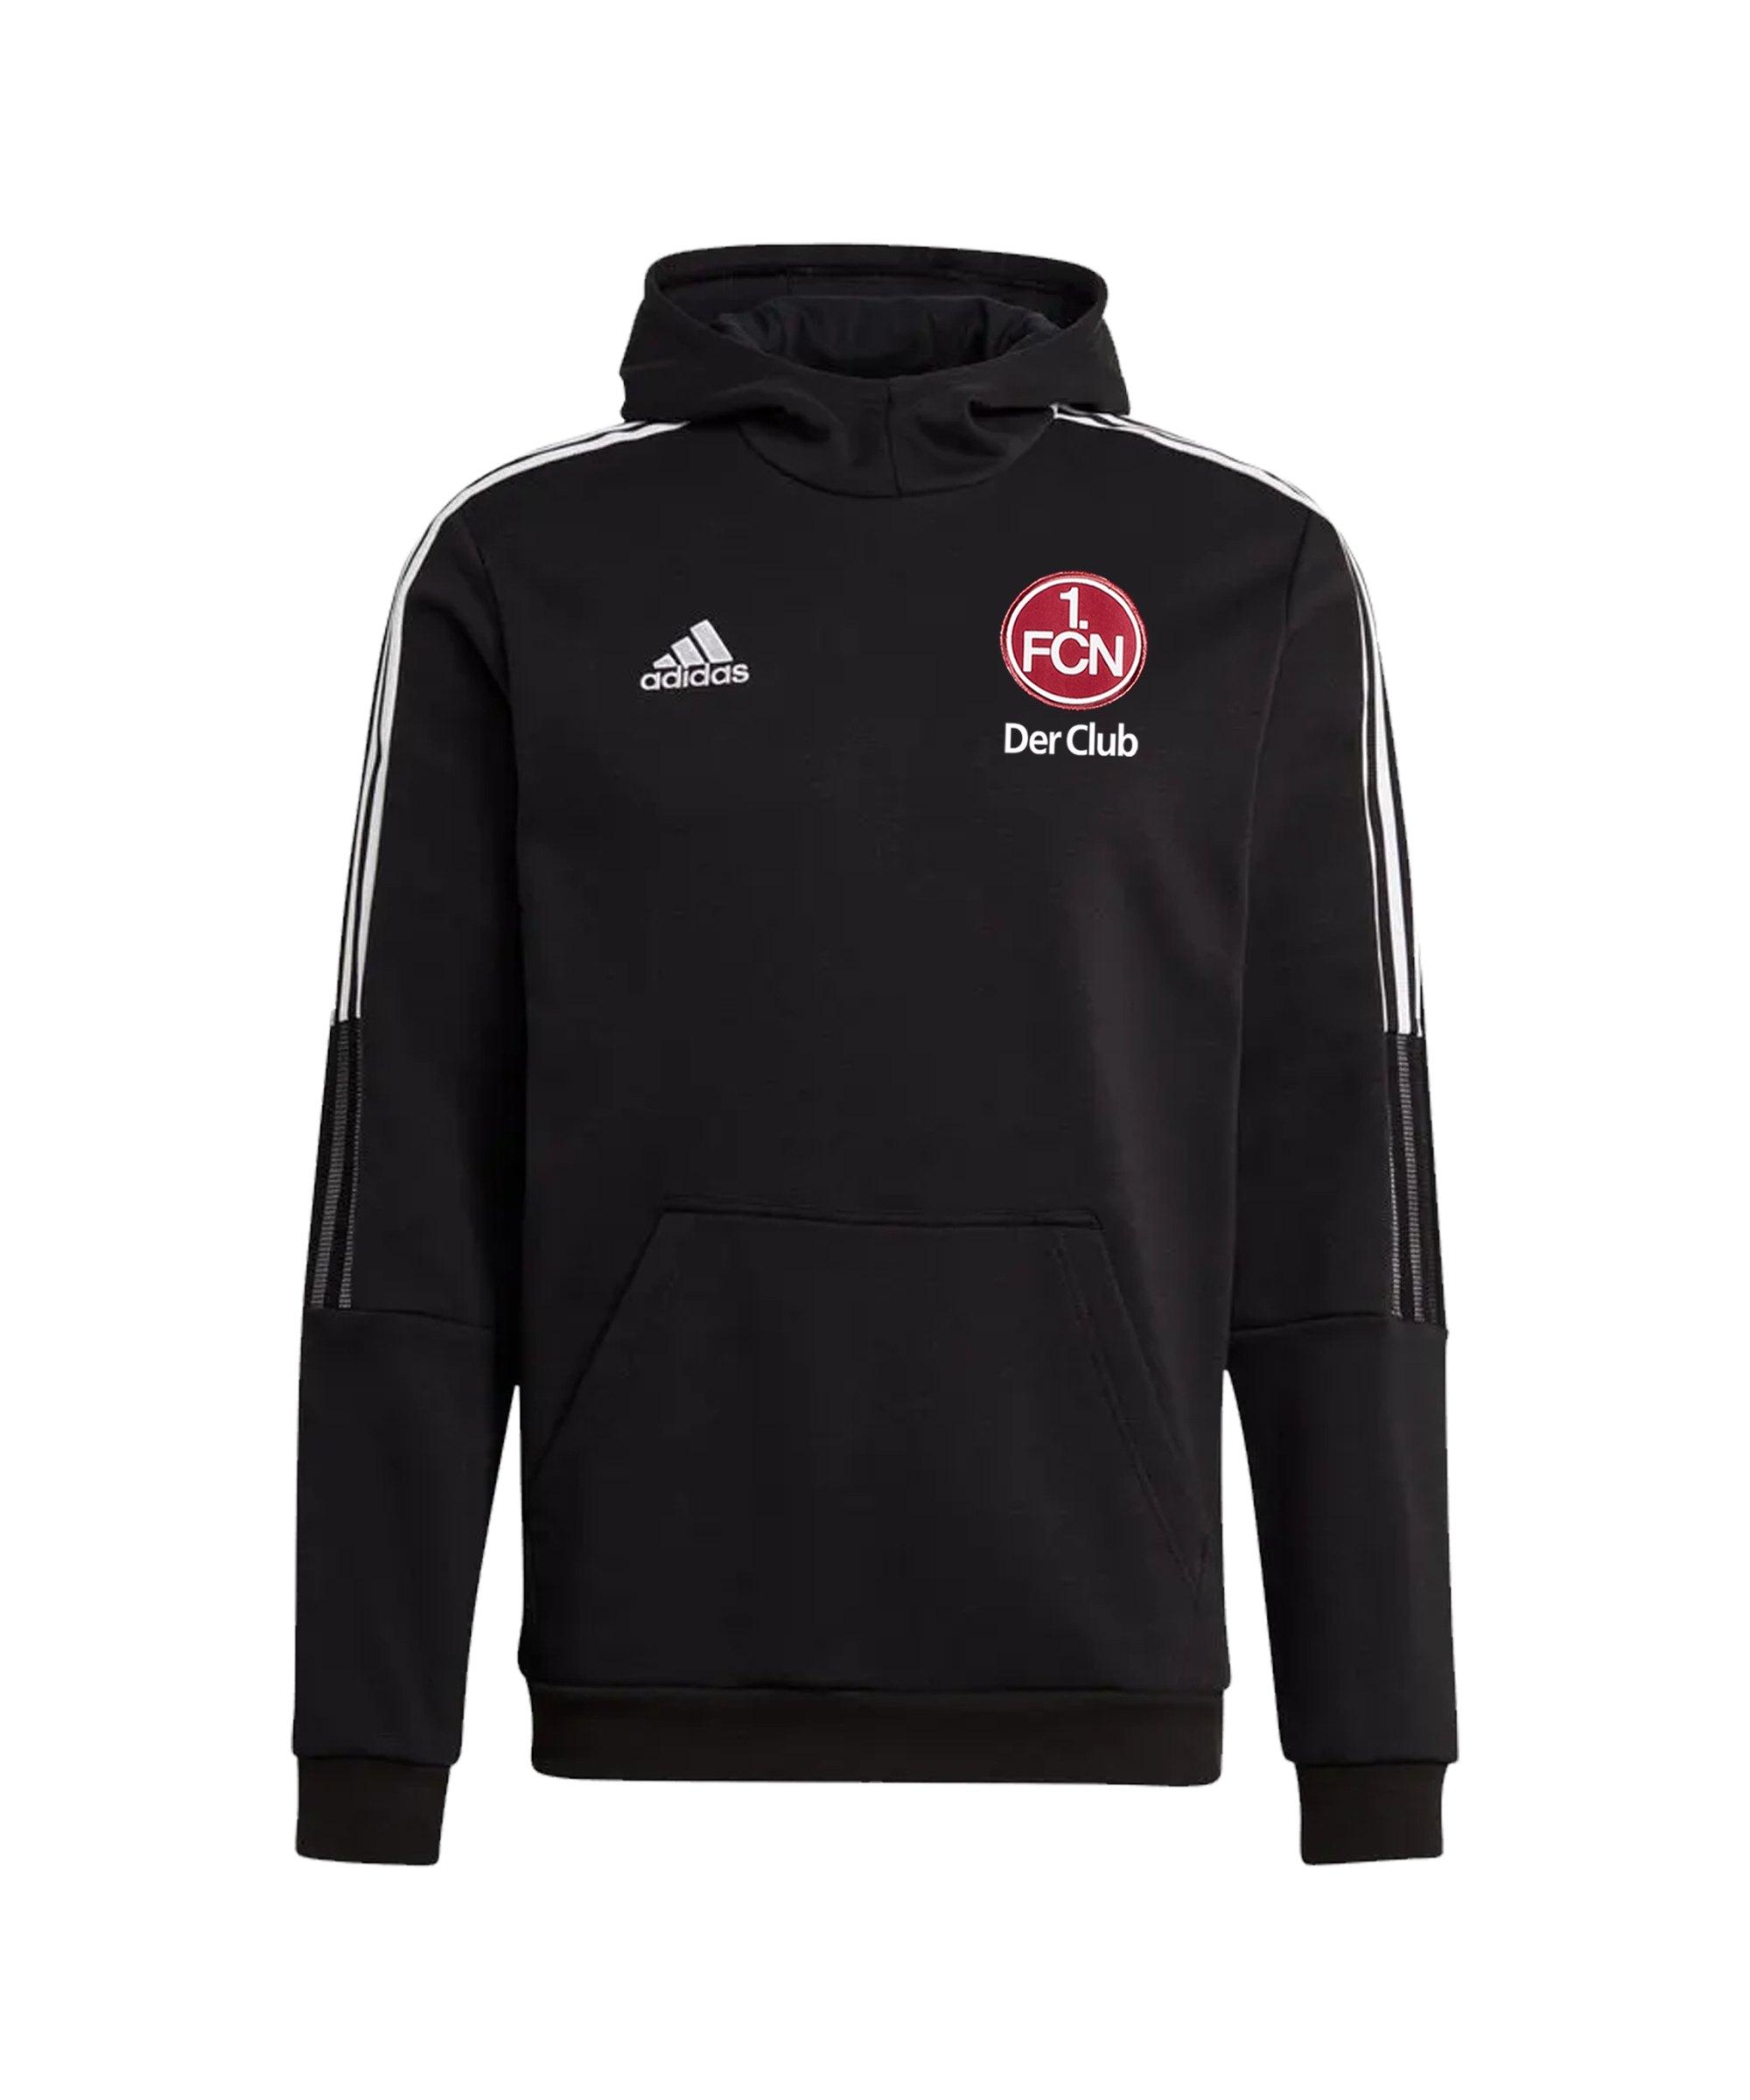 adidas 1. FC Nürnberg Hoody Schwarz - schwarz